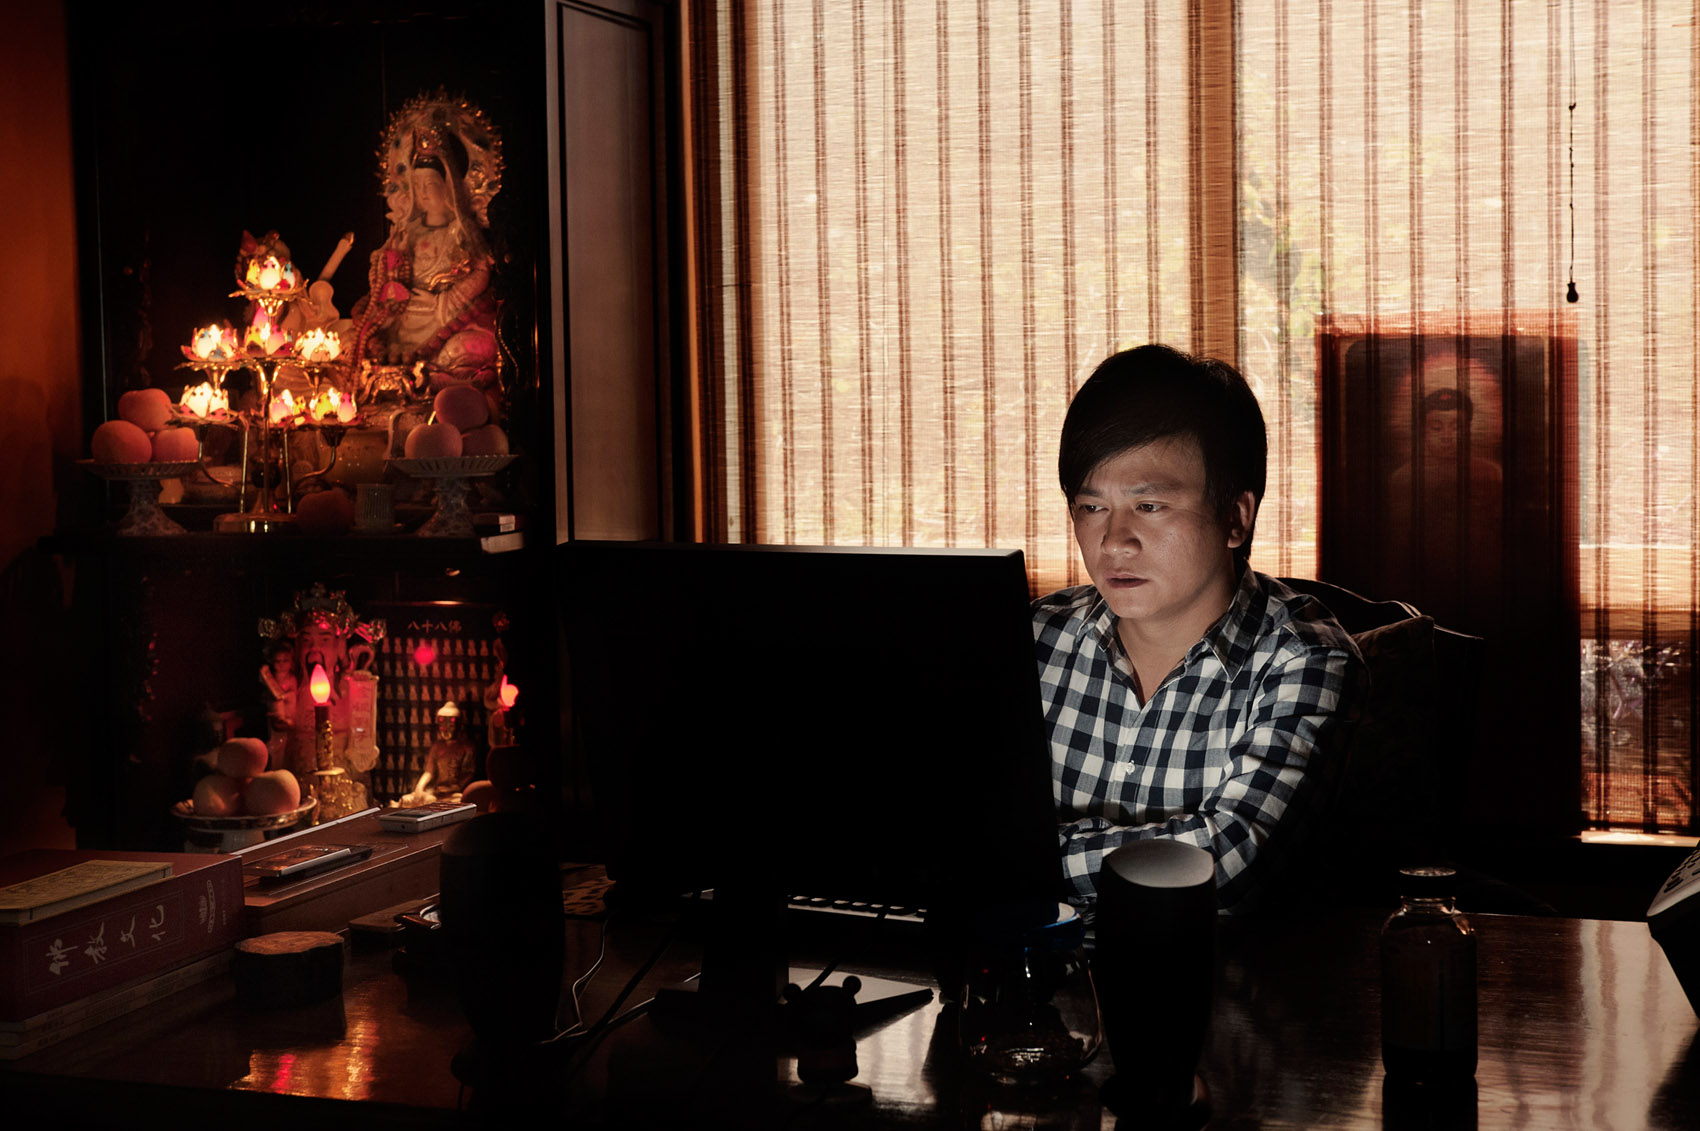 Li Chengpeng dissident blogger